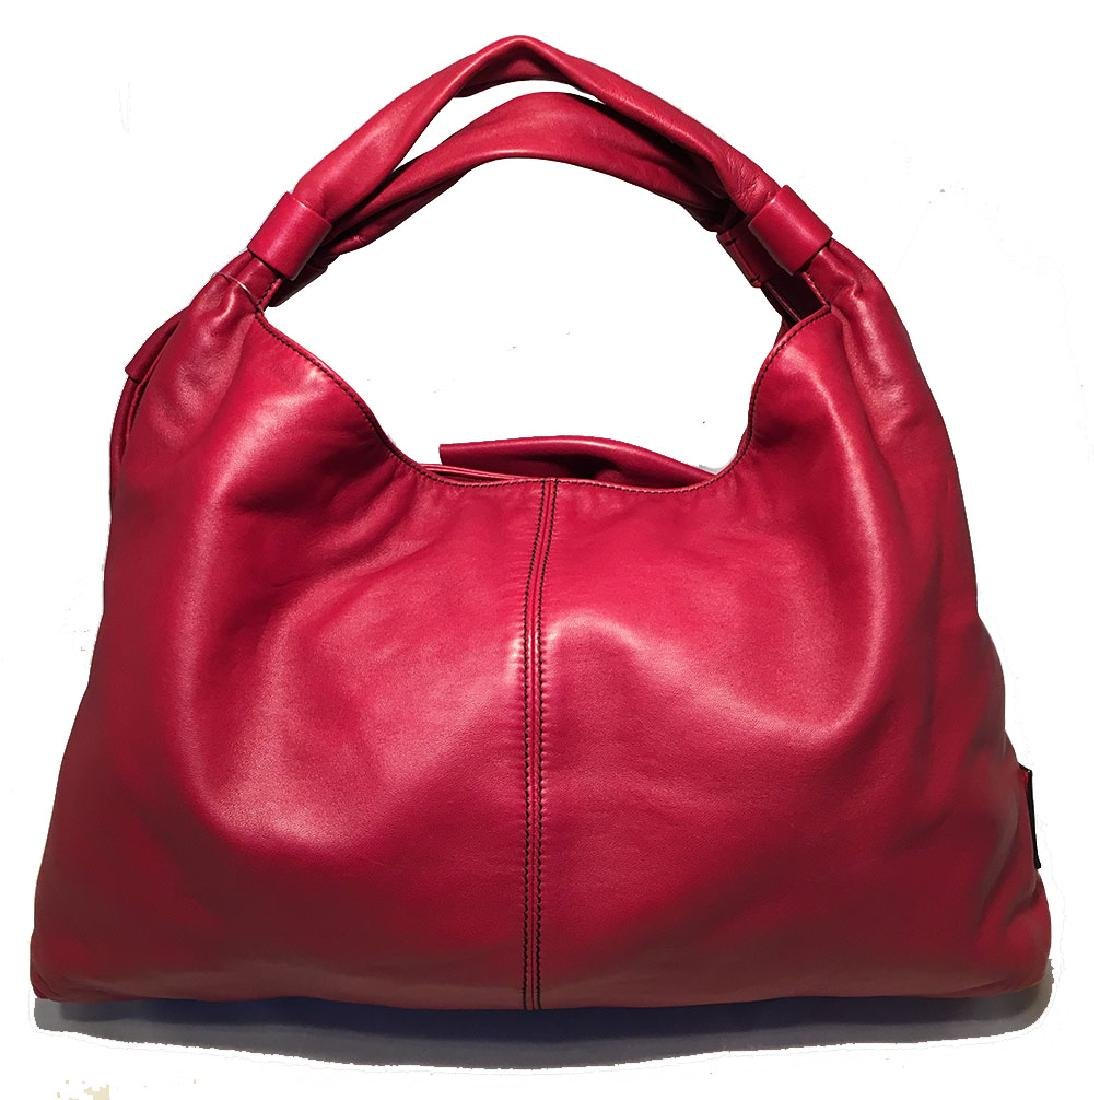 Valentino Red Leather Bow Front Hobo Shoulder Bag